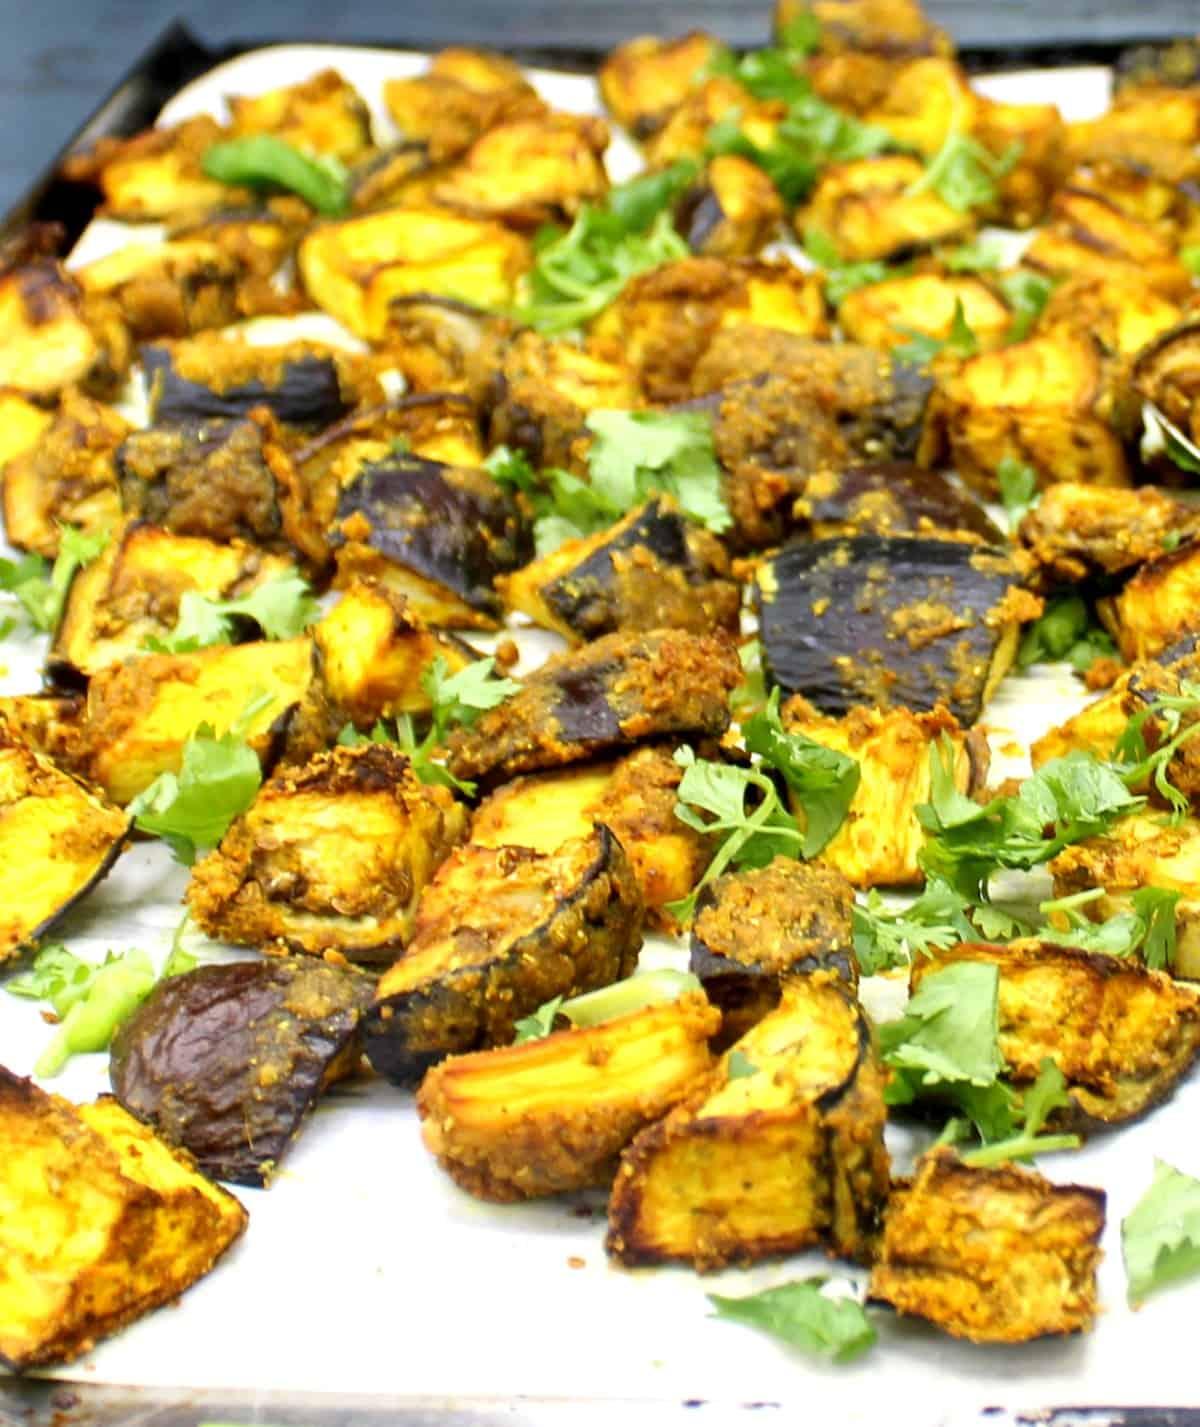 Photo of curry roasted eggplant with cilantro on baking sheet.